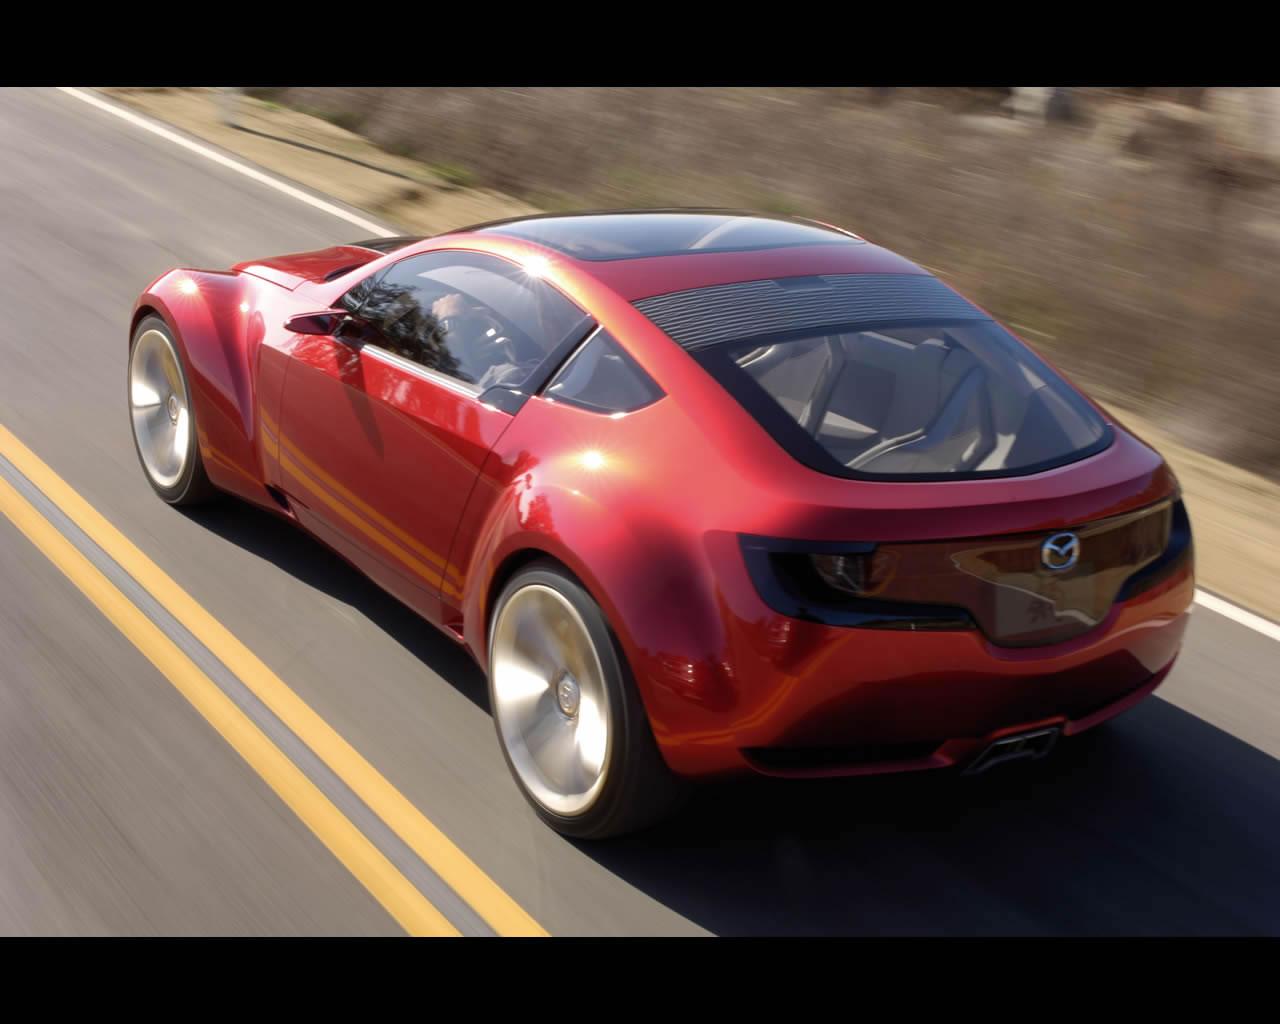 http://autoconcept-reviews.com/cars_reviews/mazda/mazda-kabura/wallpaper/Mazda_Kabura_2006_03_print.jpg